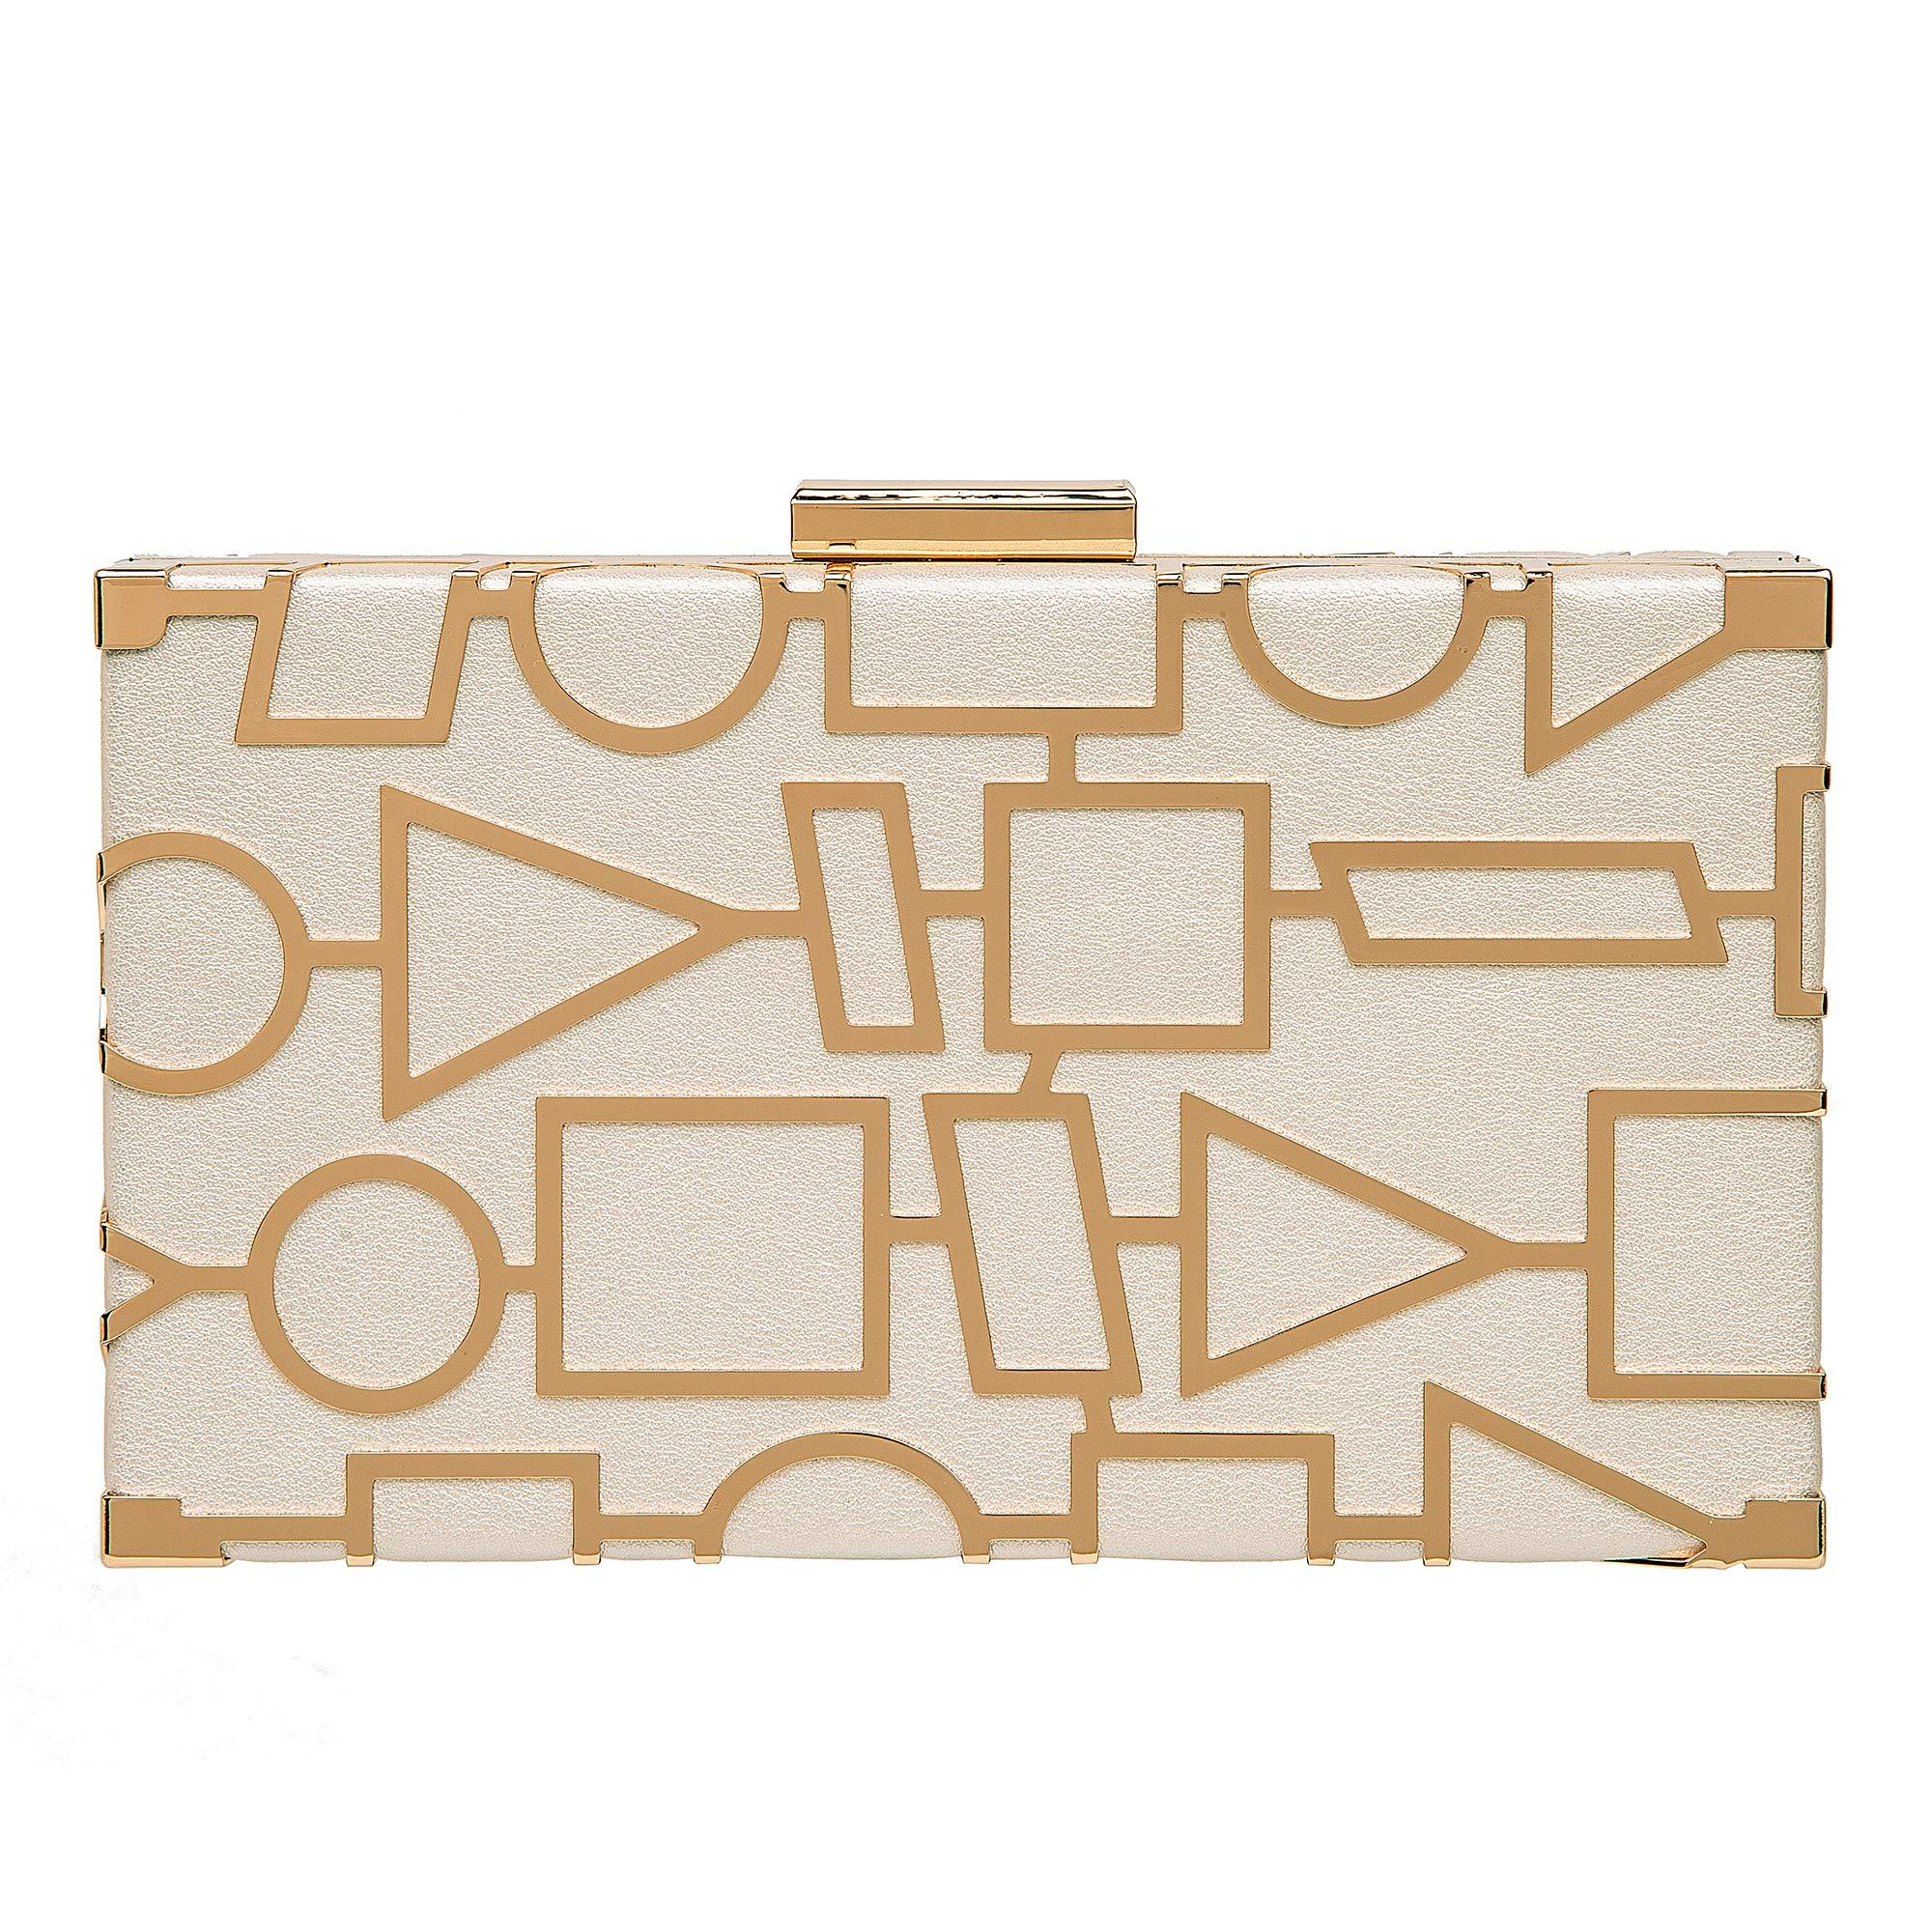 Women Evening Clutch Bag Leather Clutch Purse Exquisite Metal Hollow out Design Evening Purse